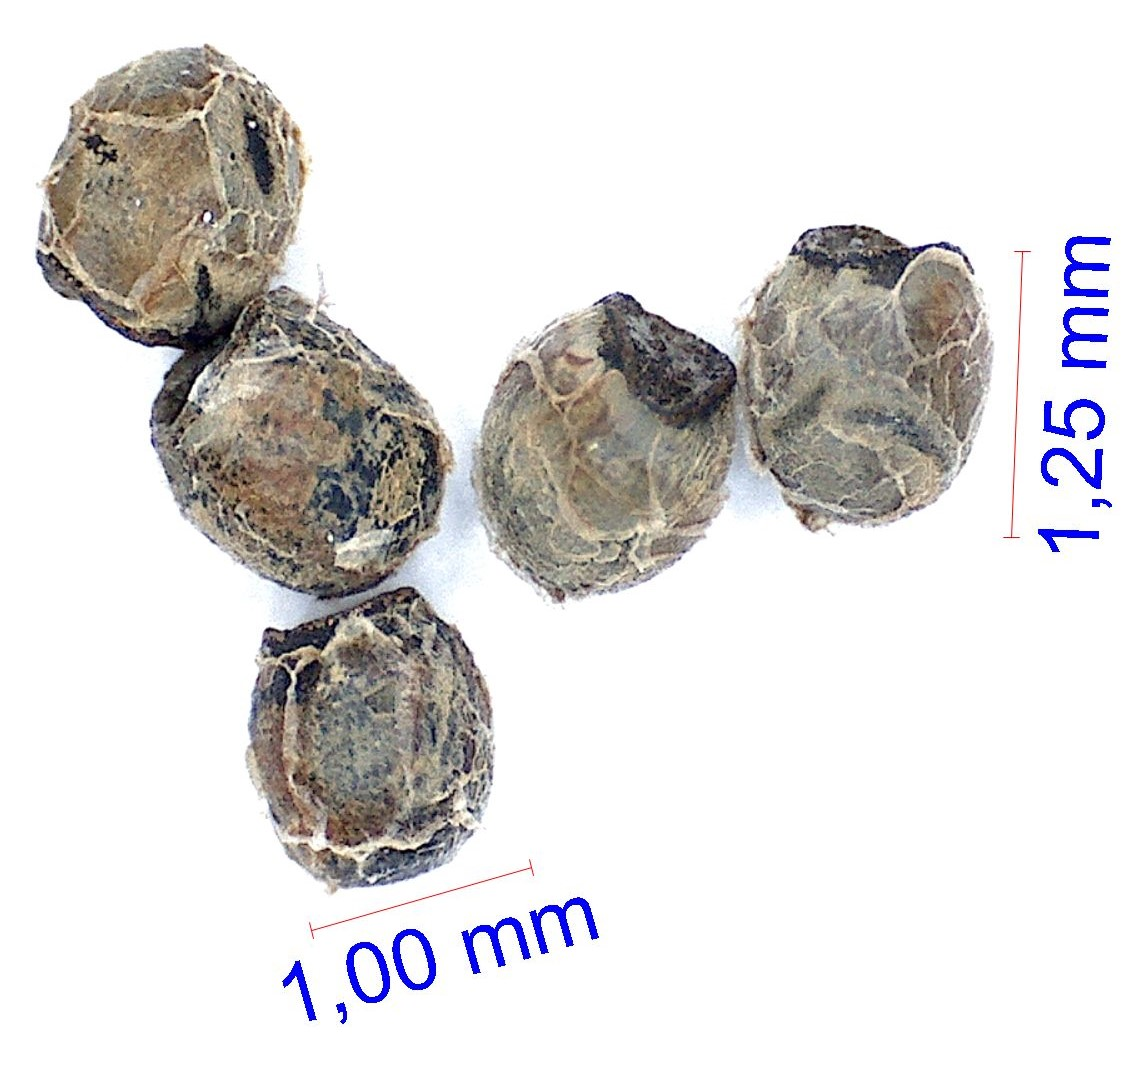 Gymnocalycium poeschlii LB © Joël Lodé/cactus-aventures.com